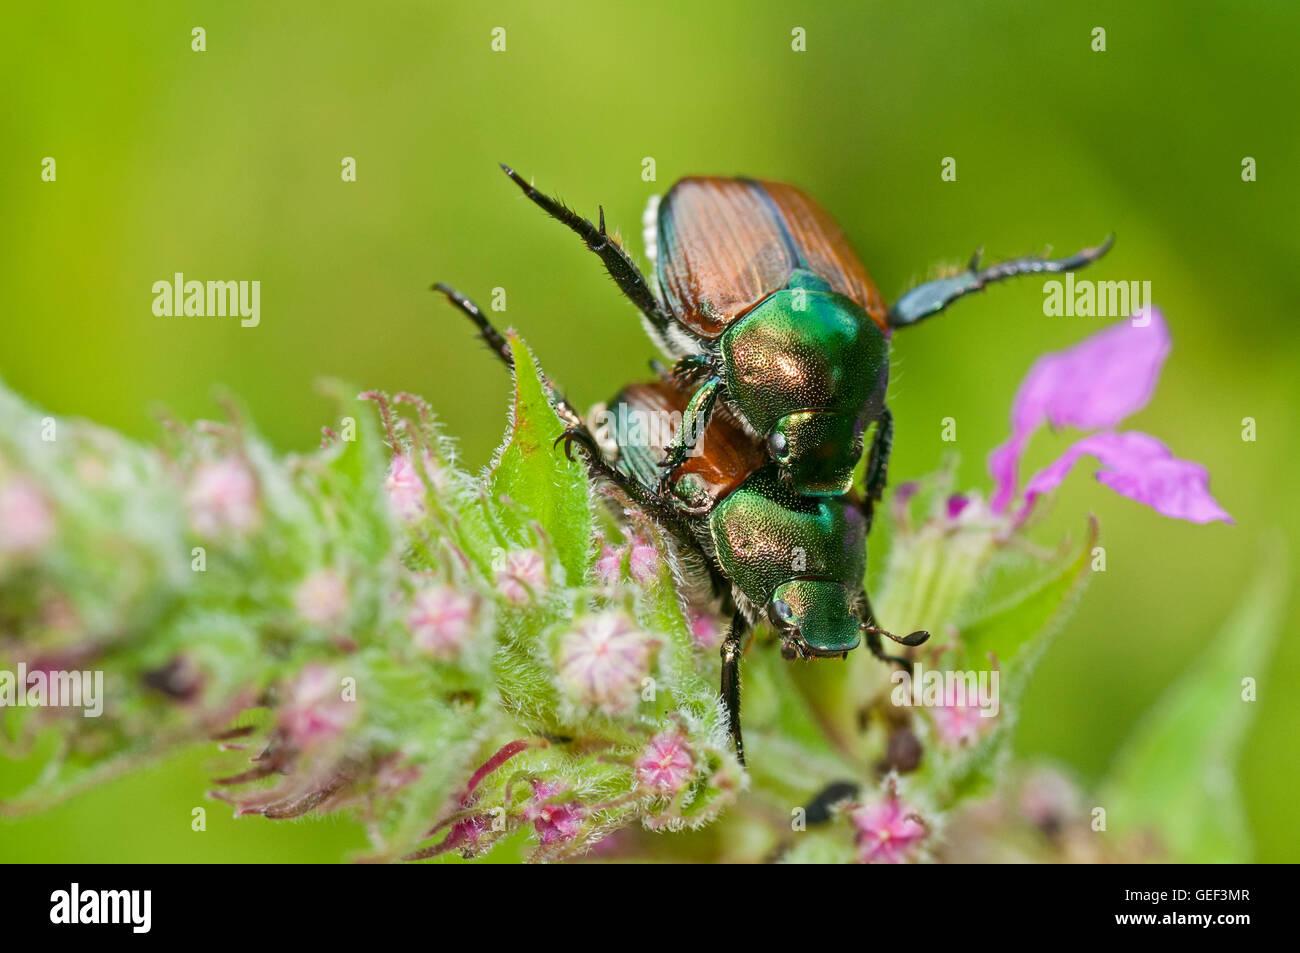 Japanese Beetles Mating - Stock Image